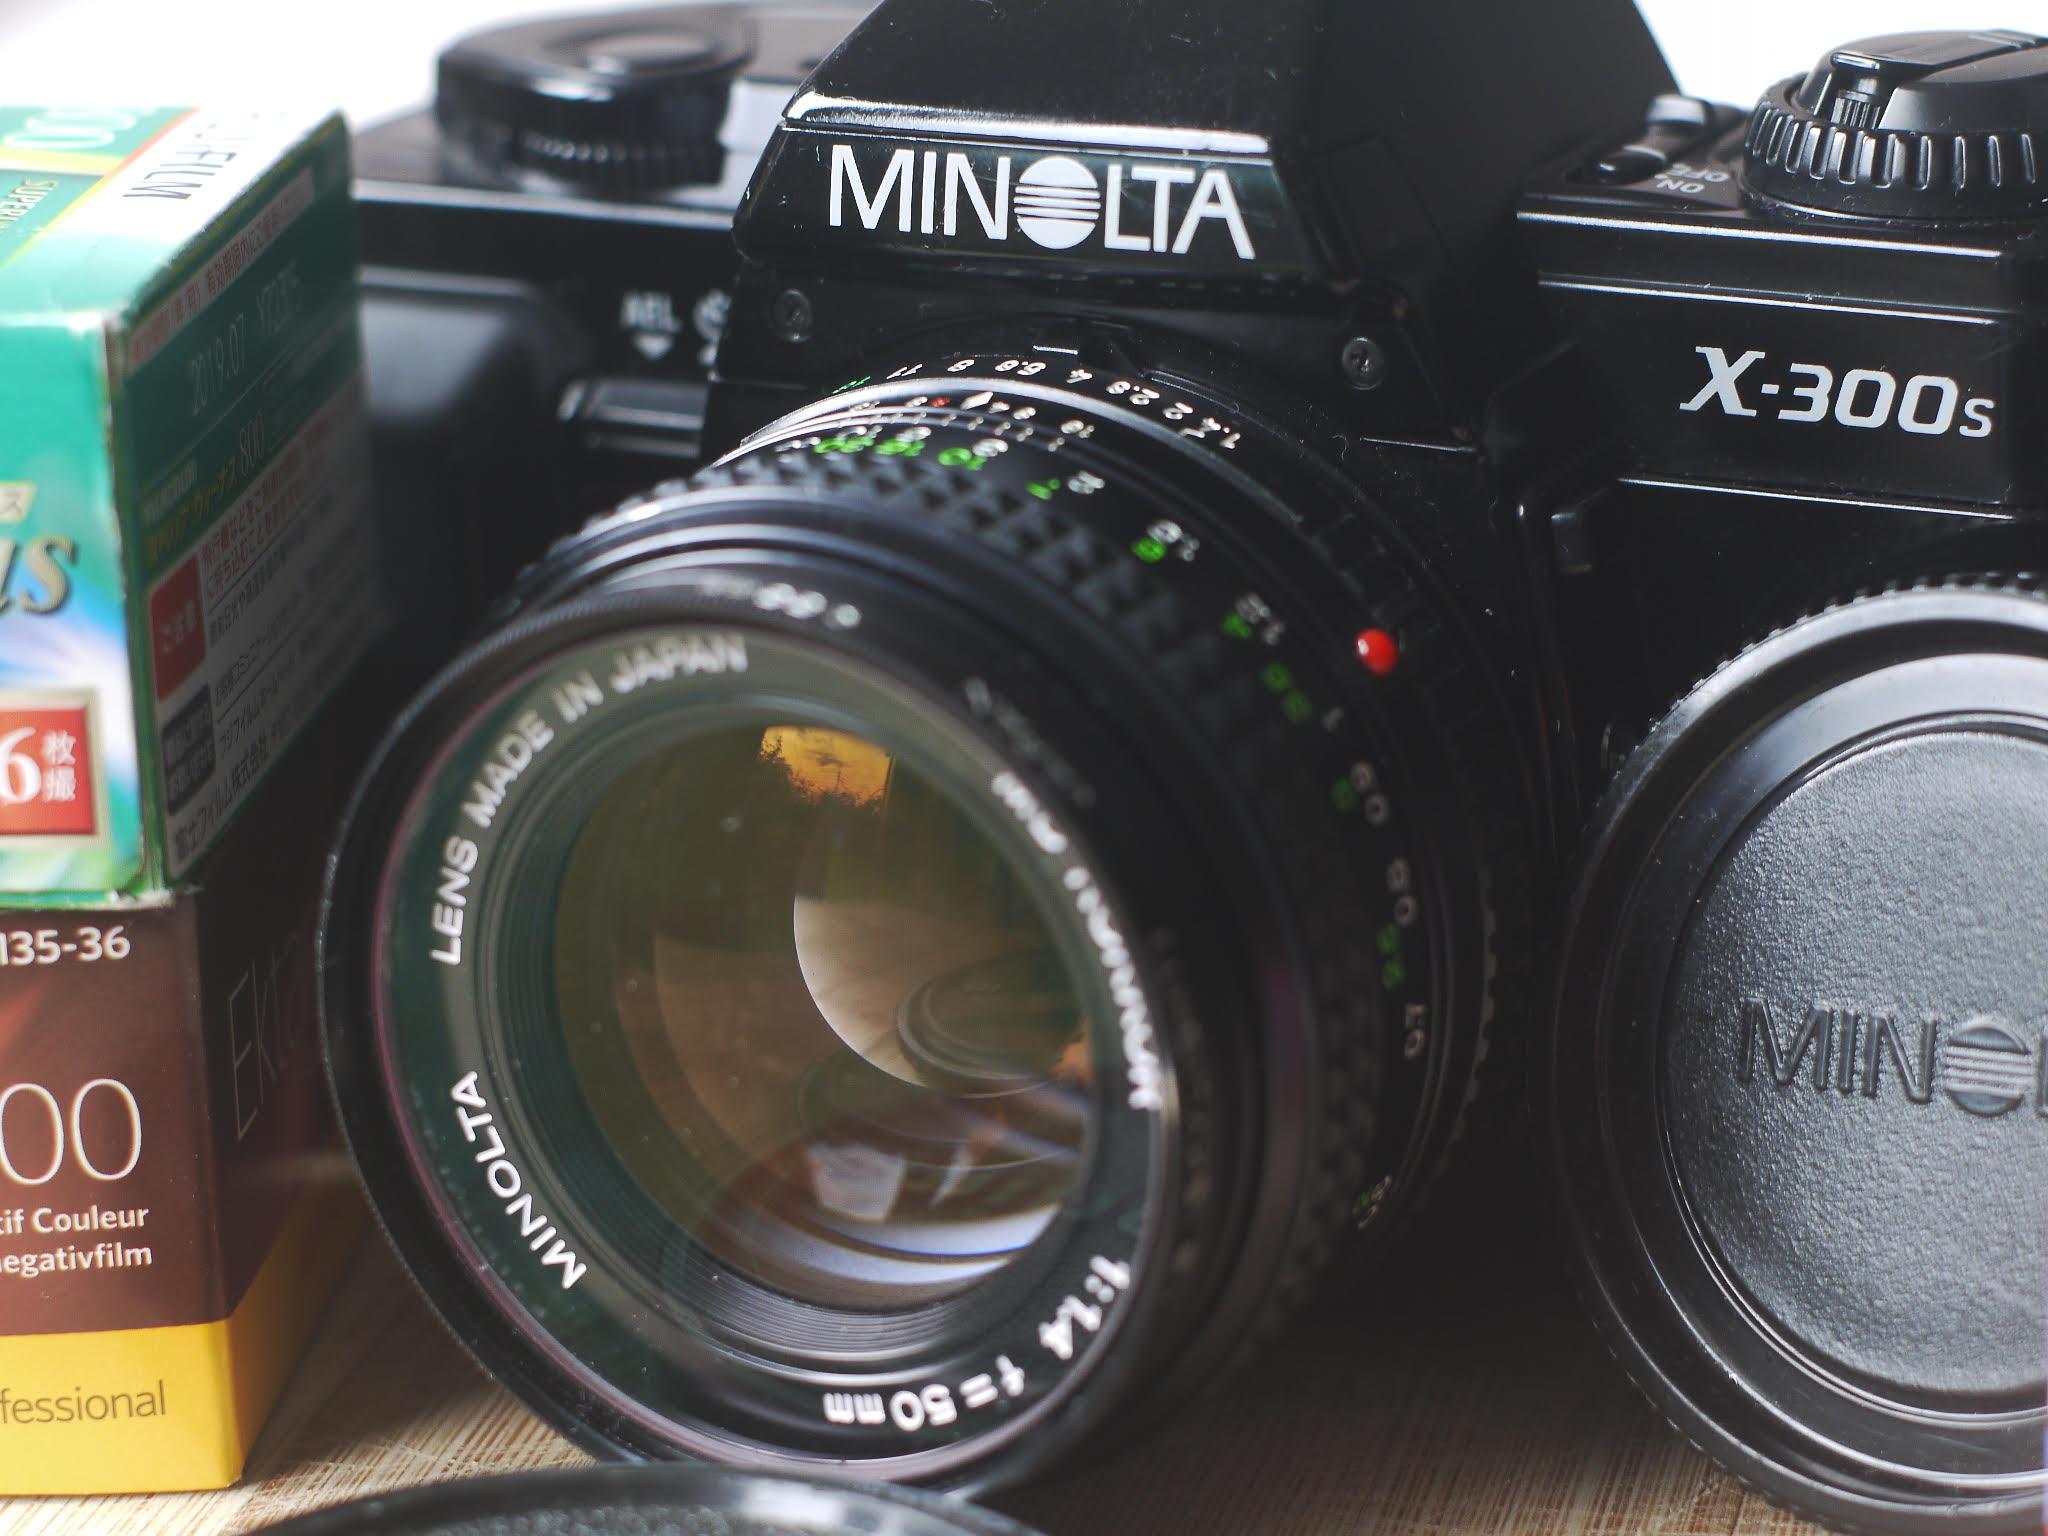 Minolta X-300s (Pic: Rob Andrews)